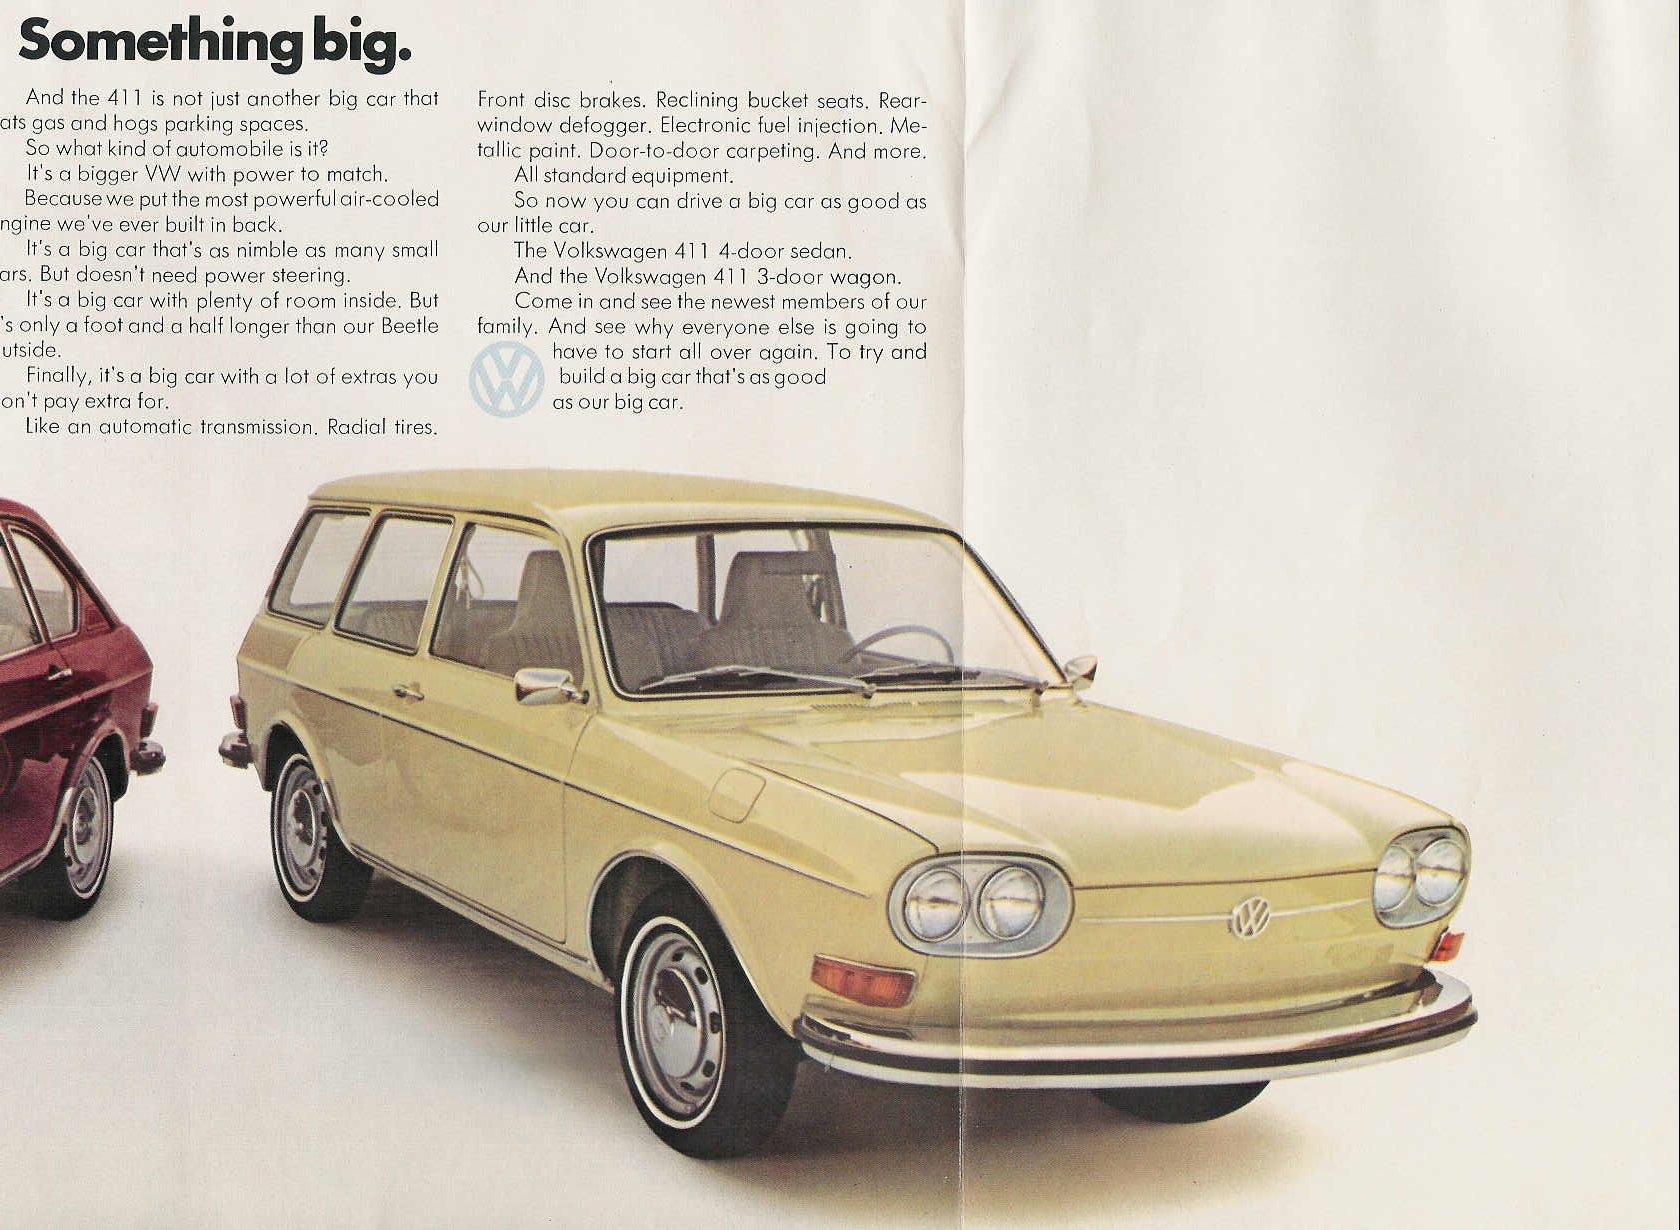 TheSamba.com :: VW Archives - 1972 VW 411 Sales Brochure